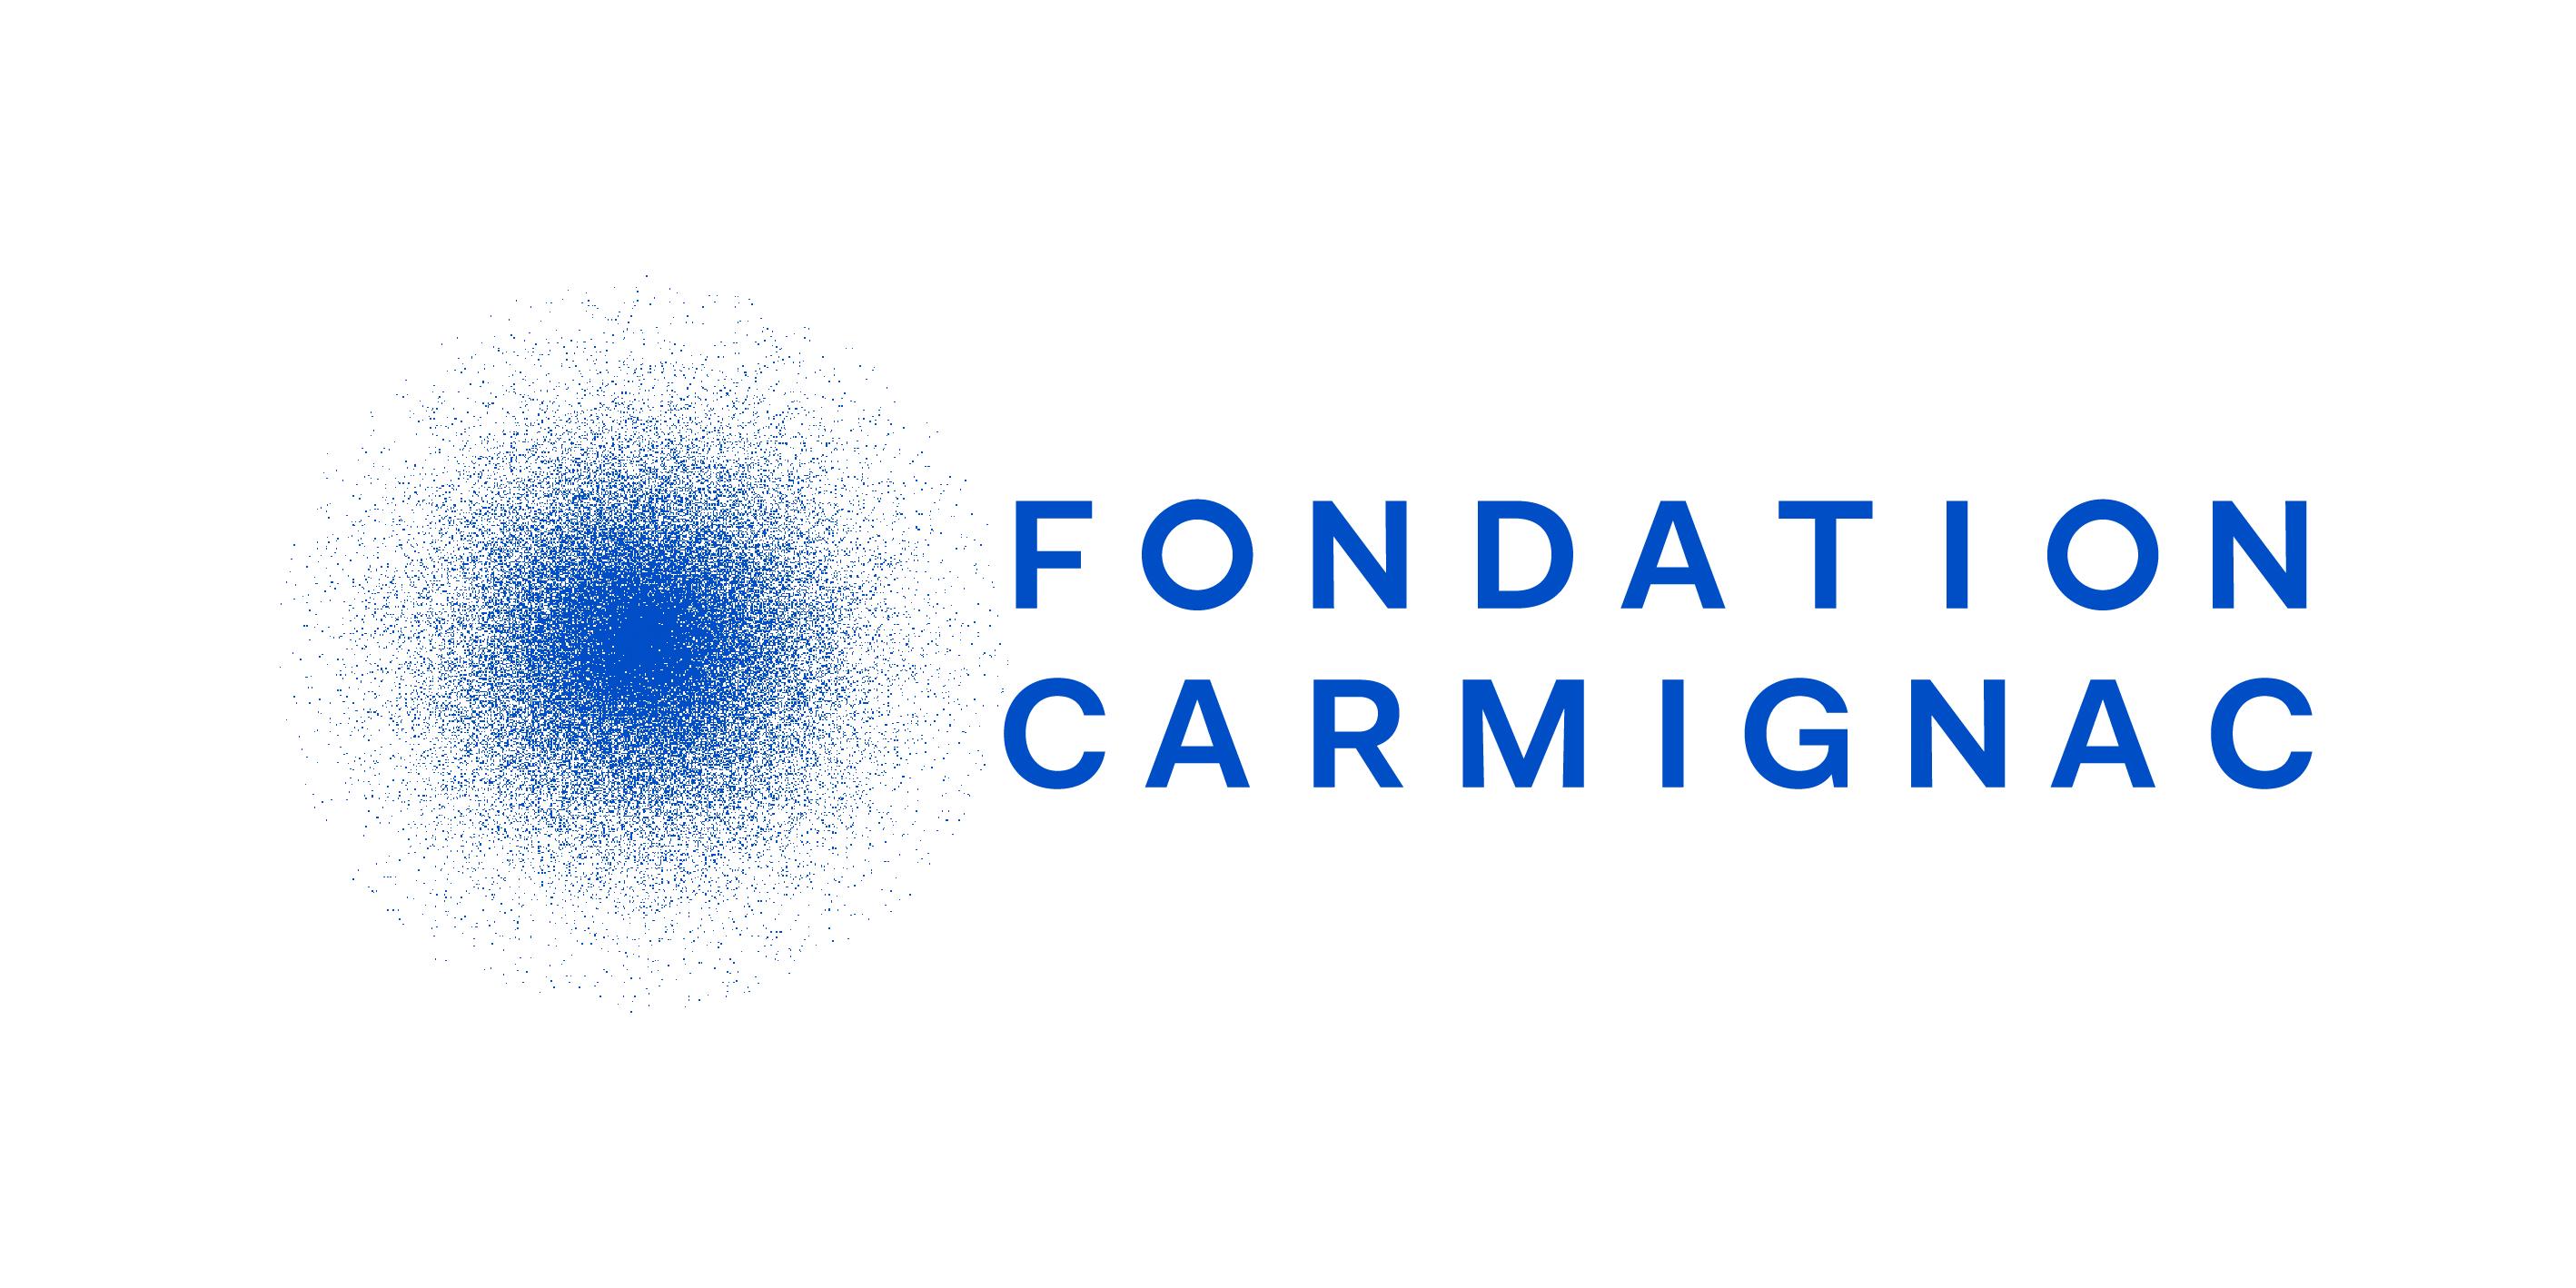 Fondation Carmignac